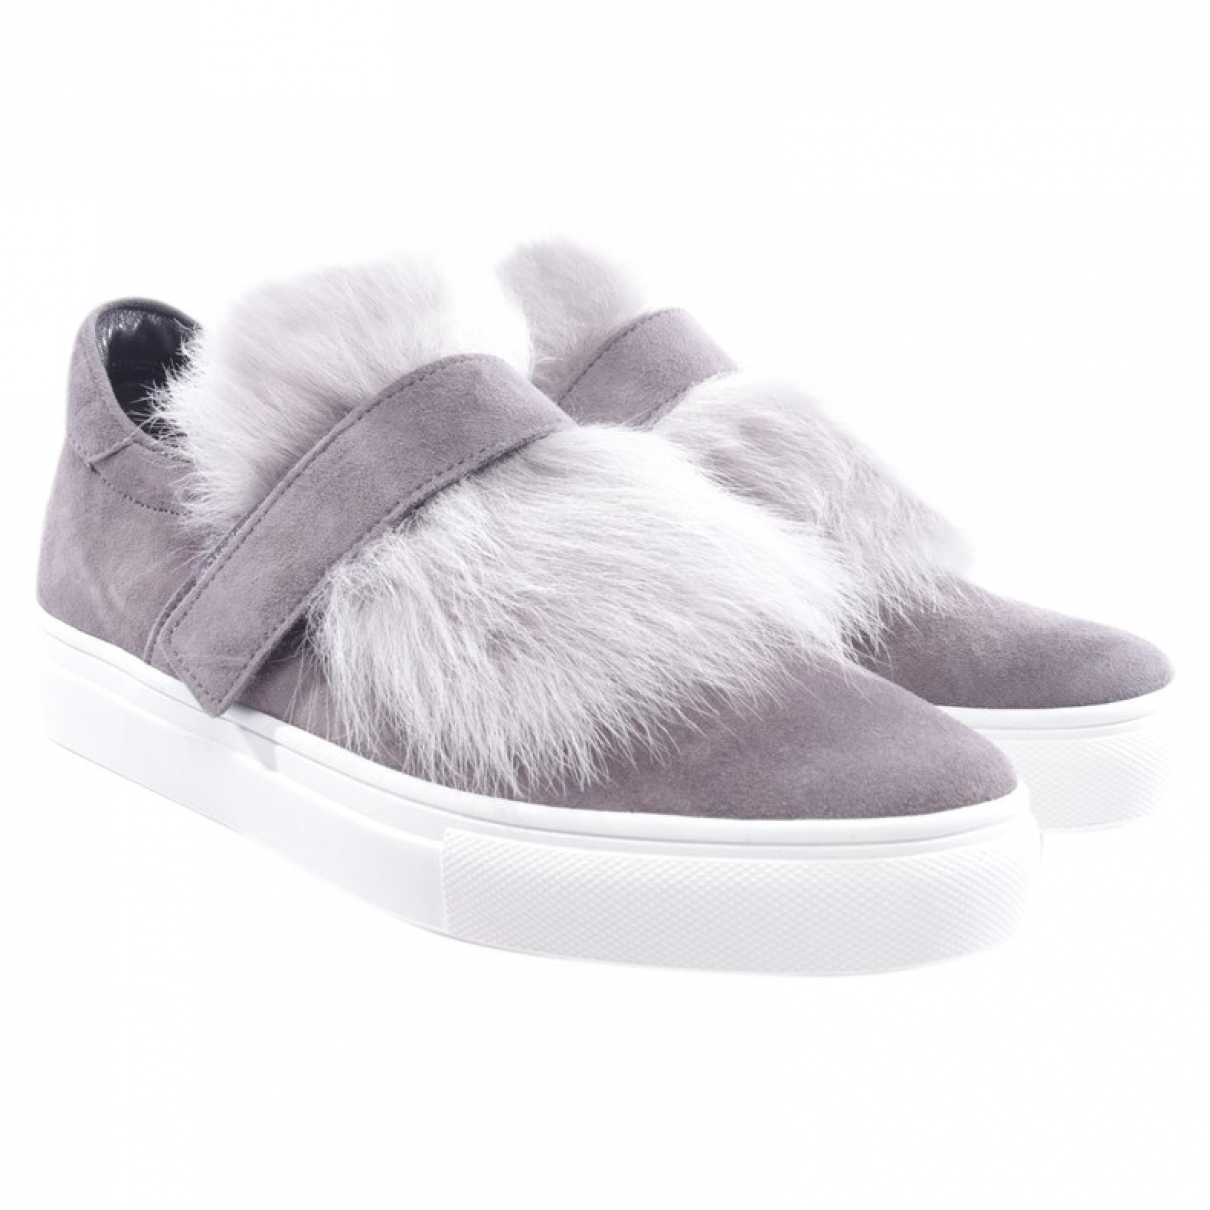 Kennel Und Schmenger \N Grey Leather Flats for Women 37.5 EU